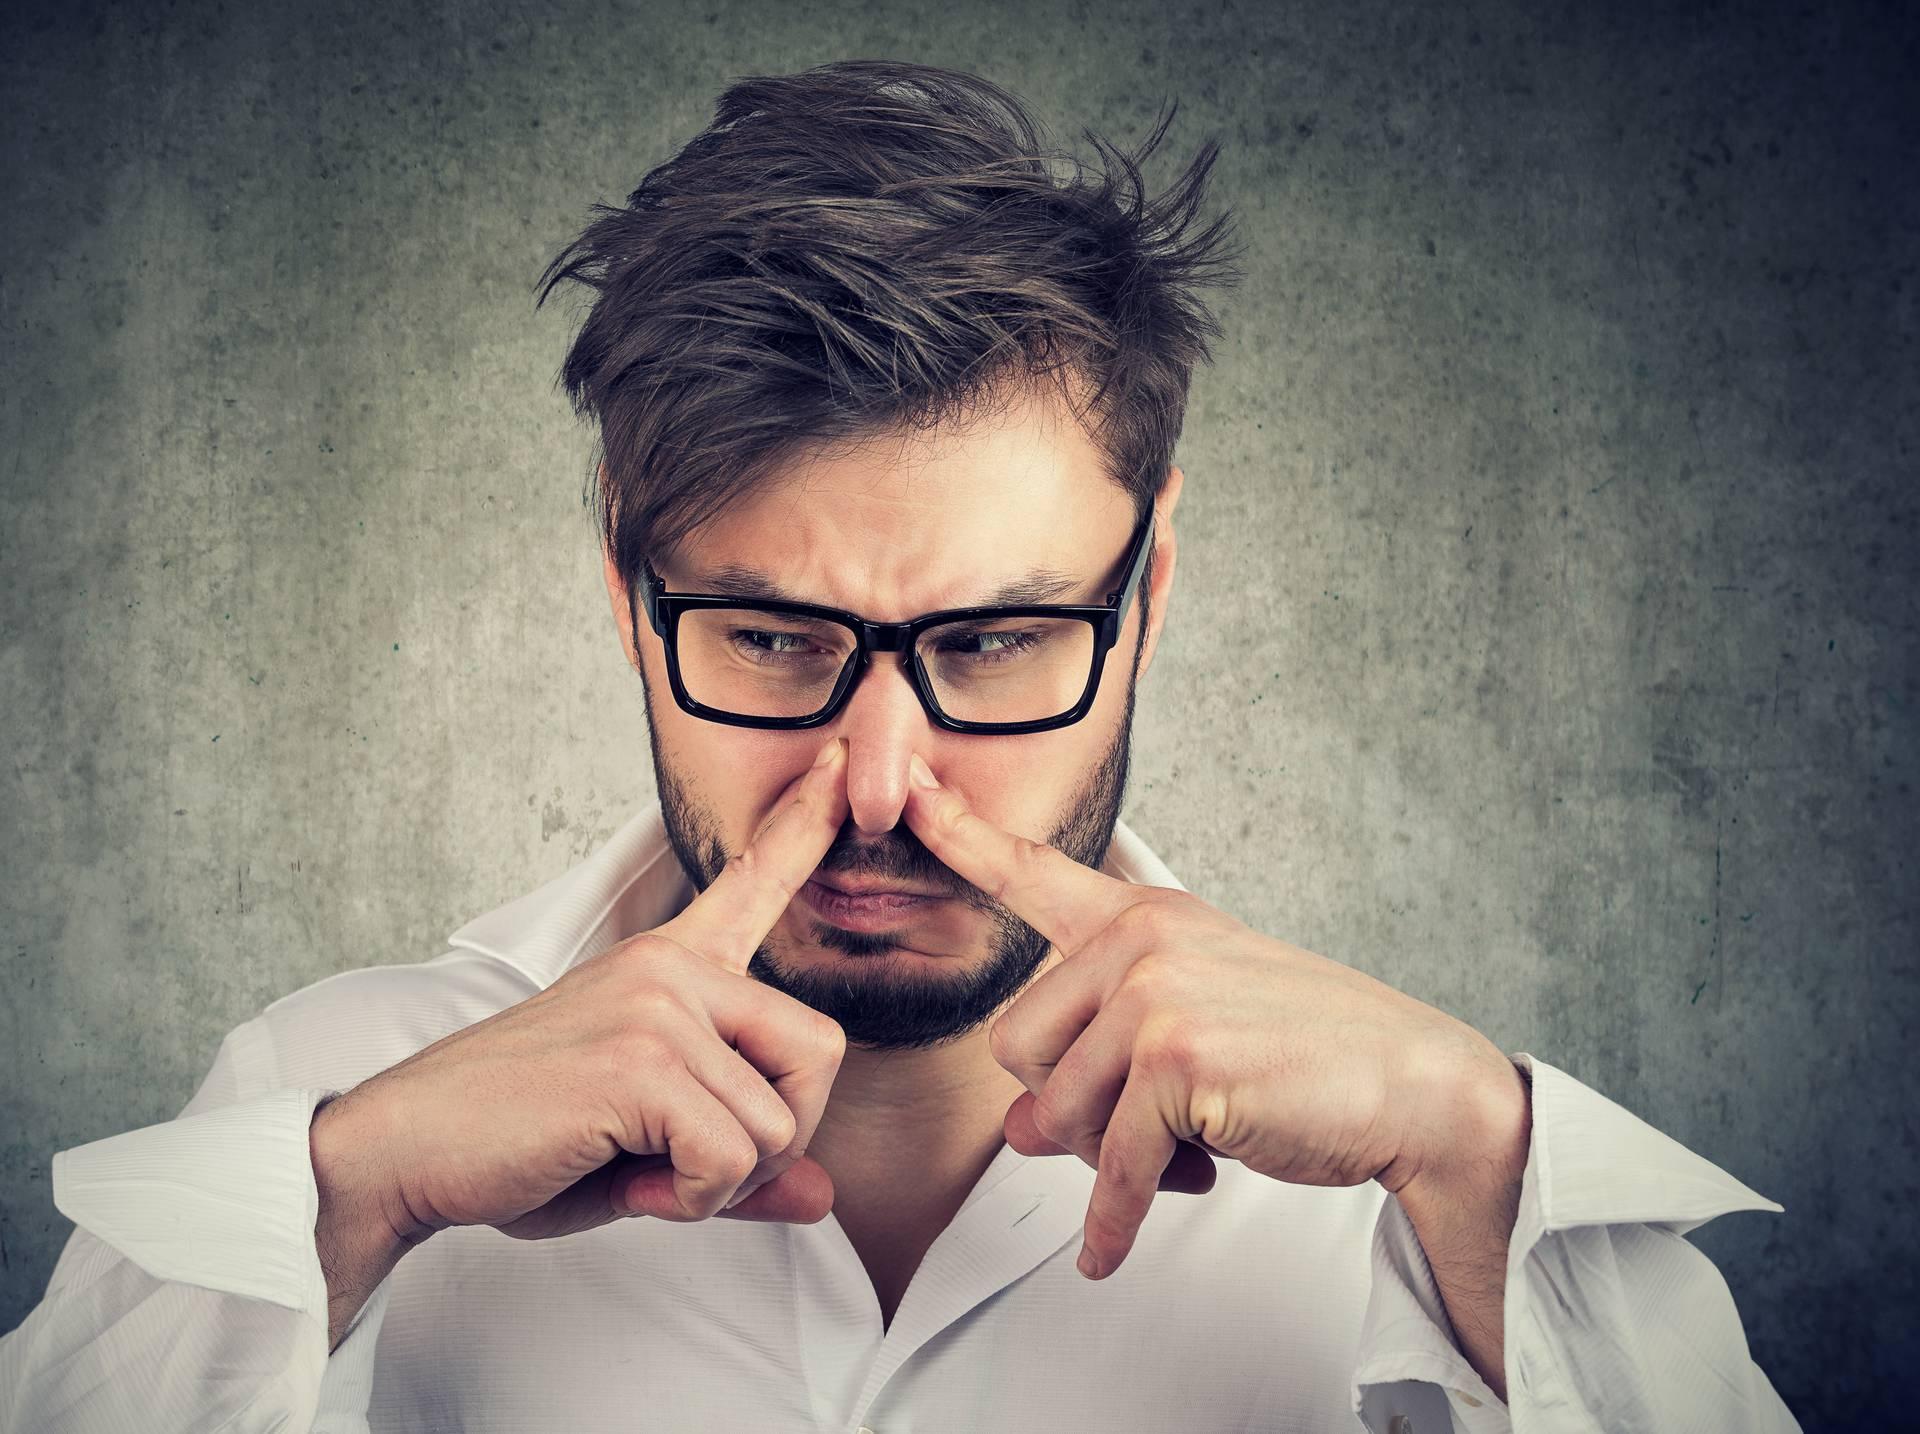 Bolesti prepoznajte po mirisu: Dijabetes miriše po acetonu